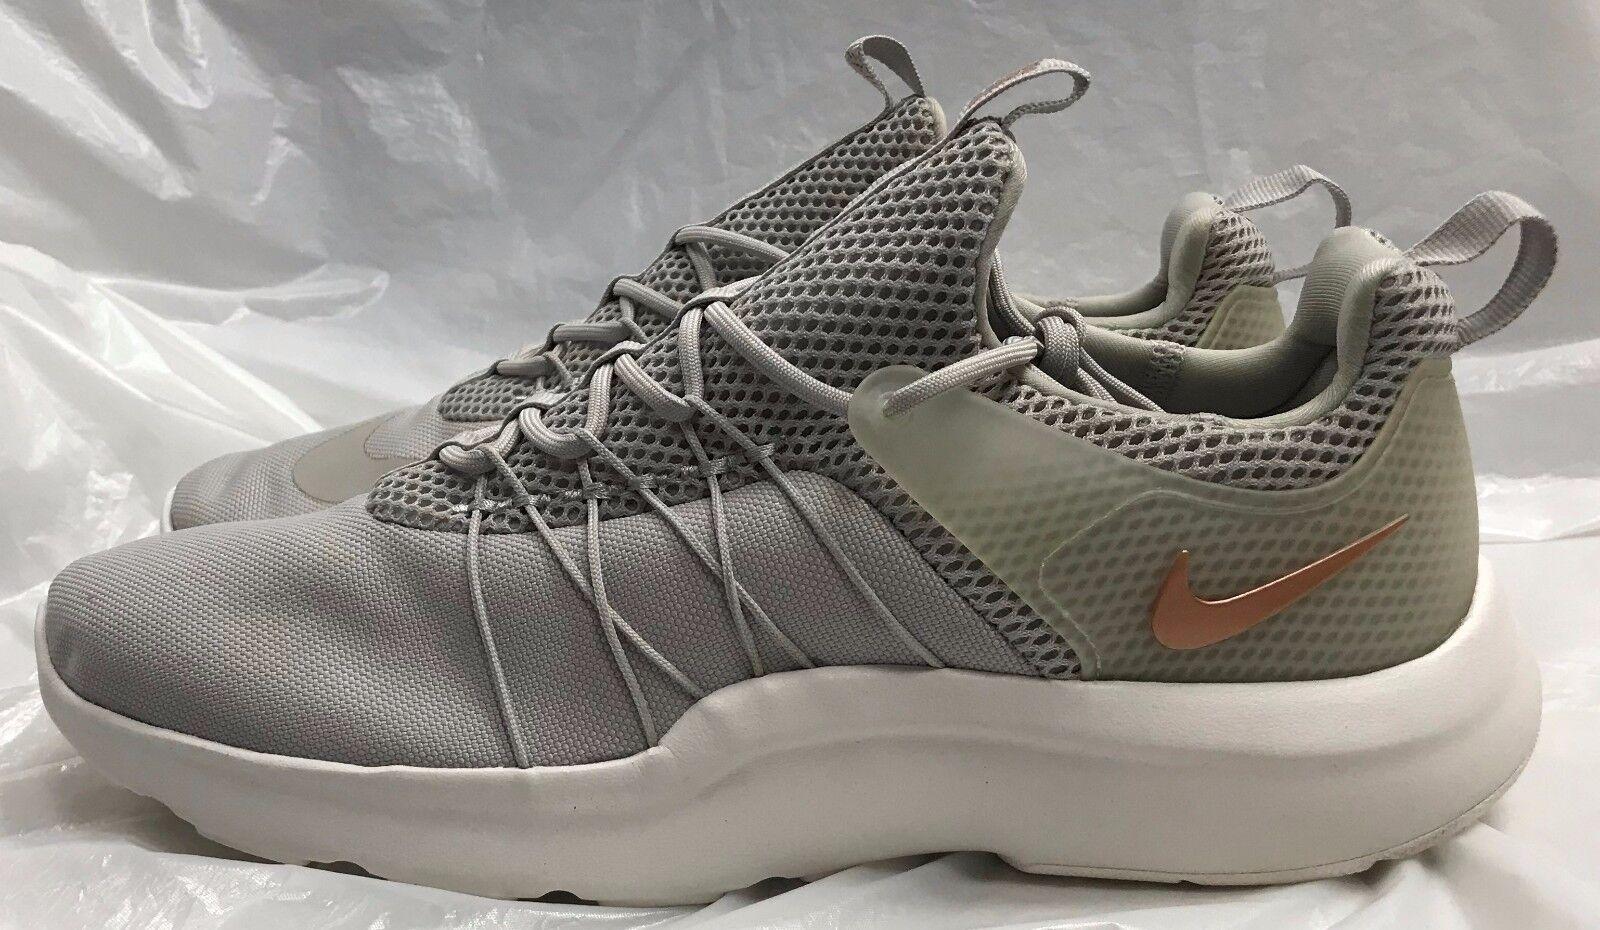 Nike darwin luce di ferro metallico rosso bronzo m / noi uomini (819959 004)